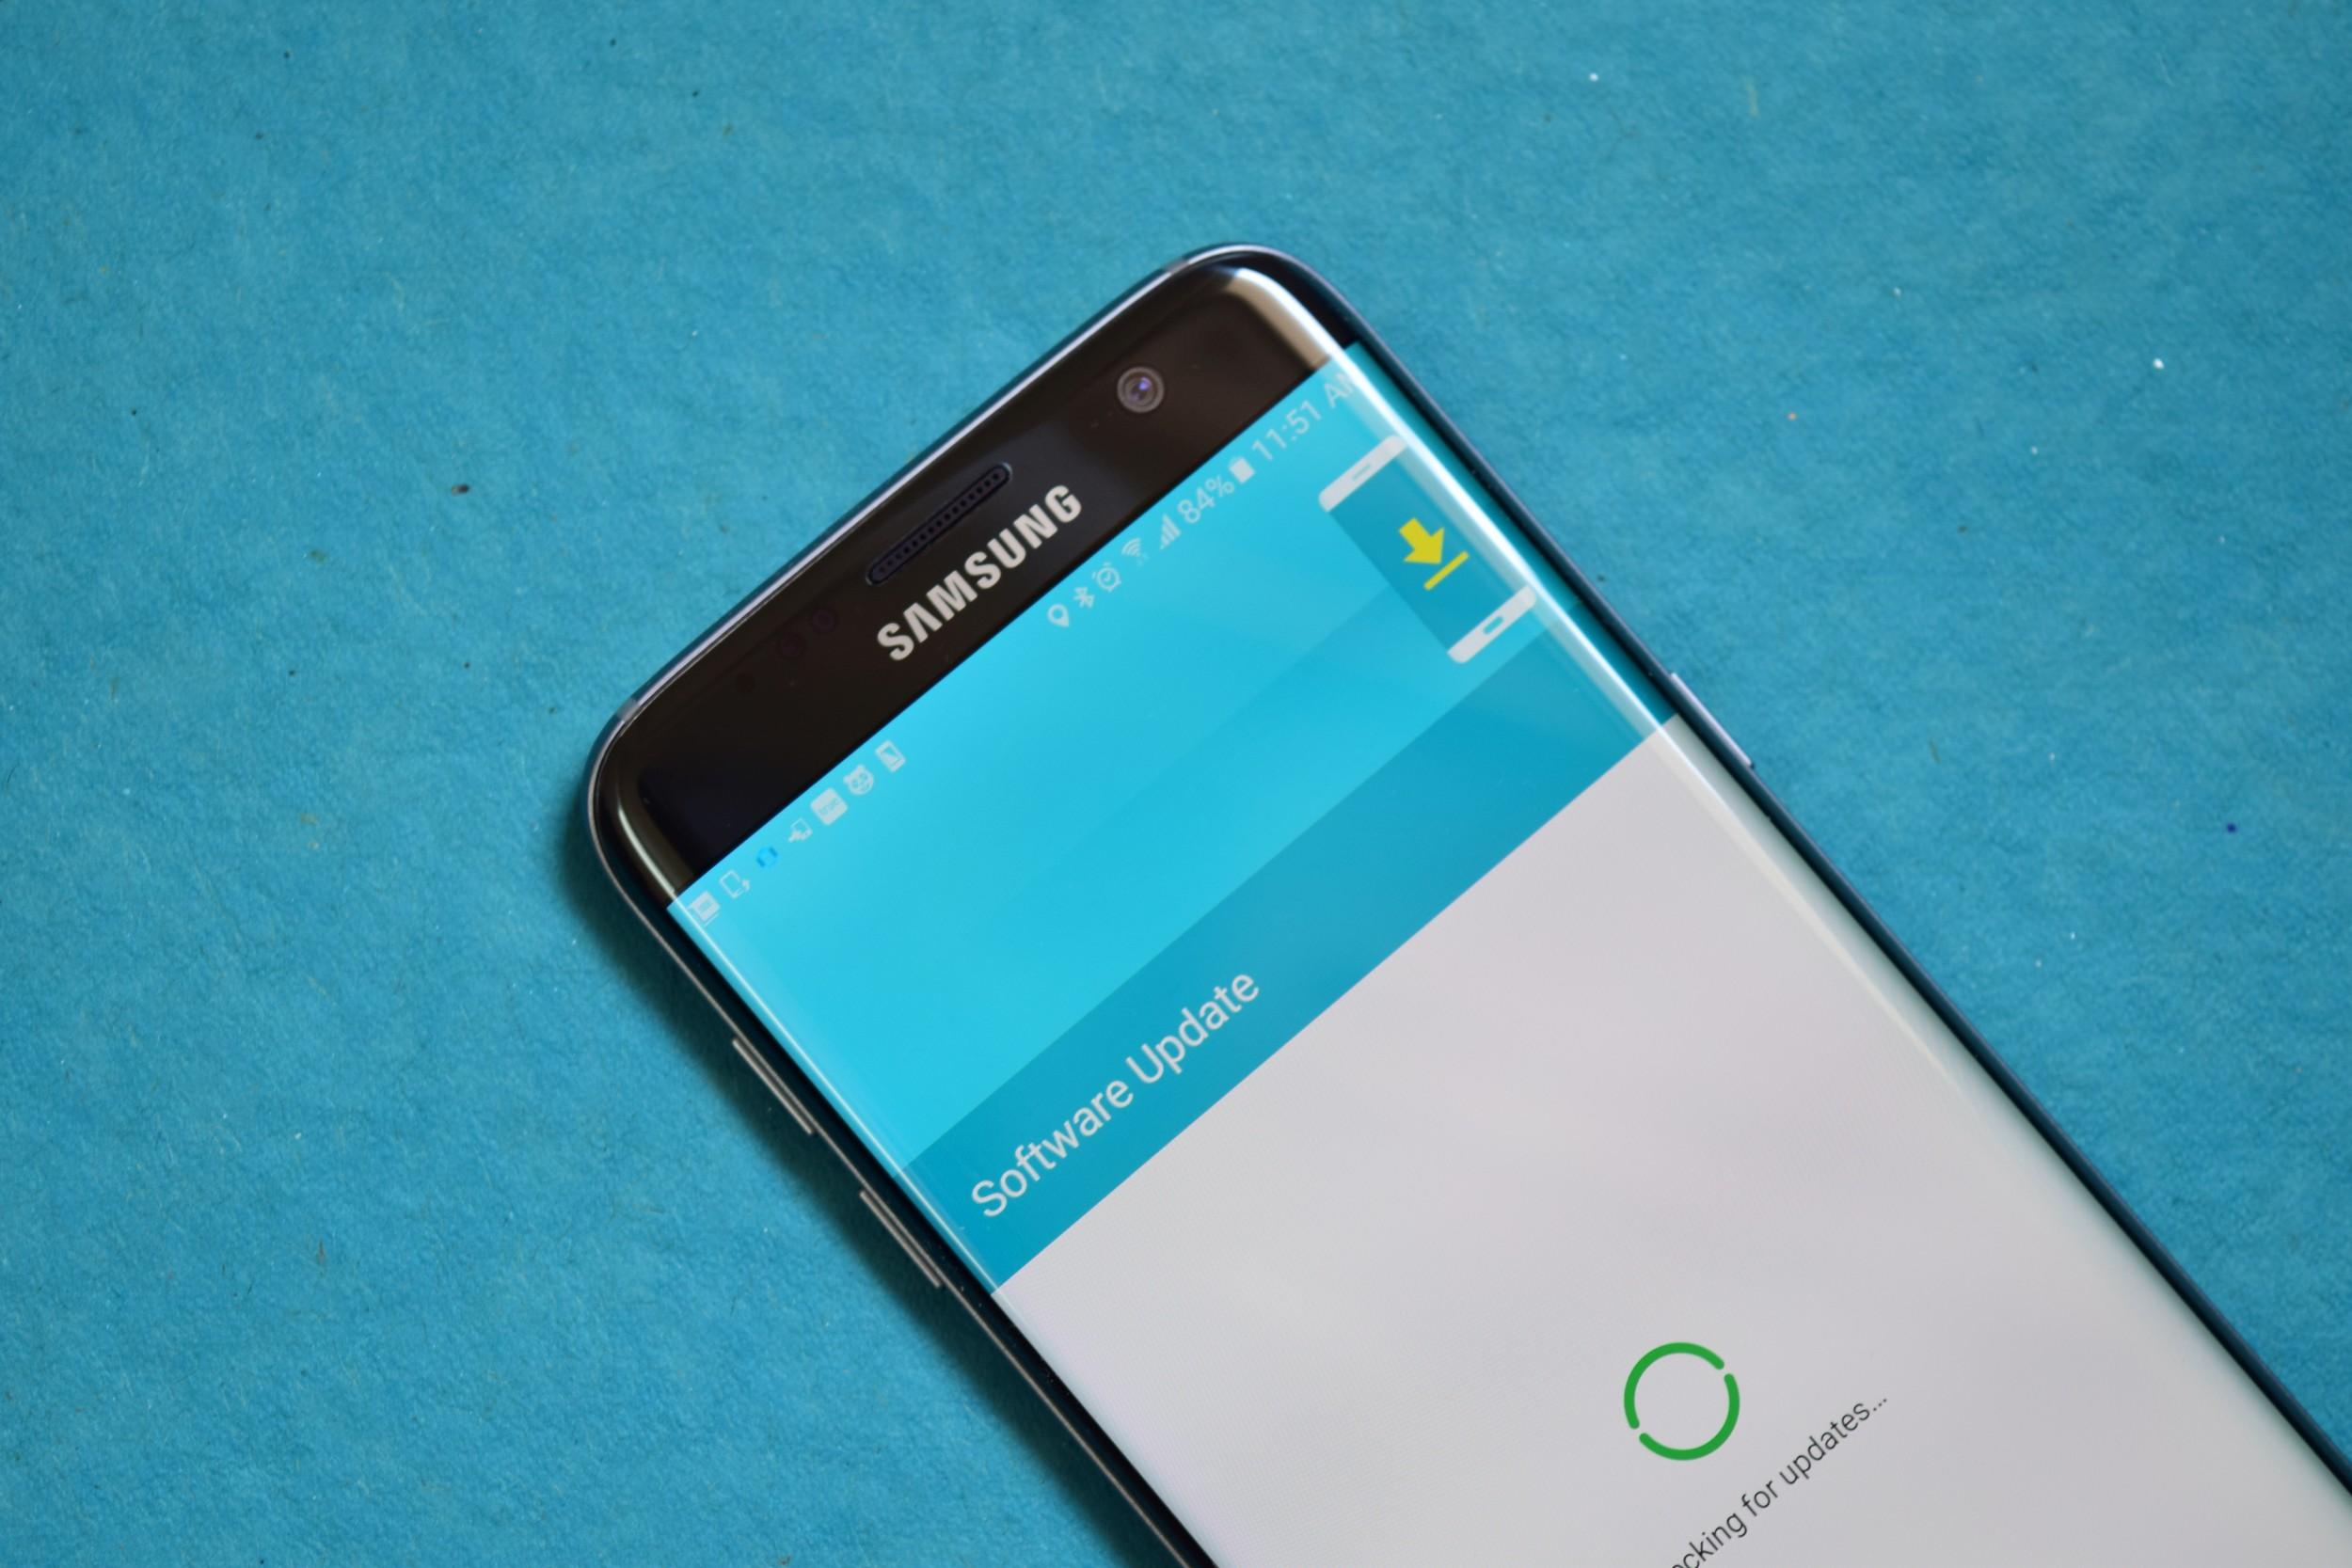 11-29-2016 Firmware Updates: Galaxy S7 edge, Galaxy Note 4, Galaxy